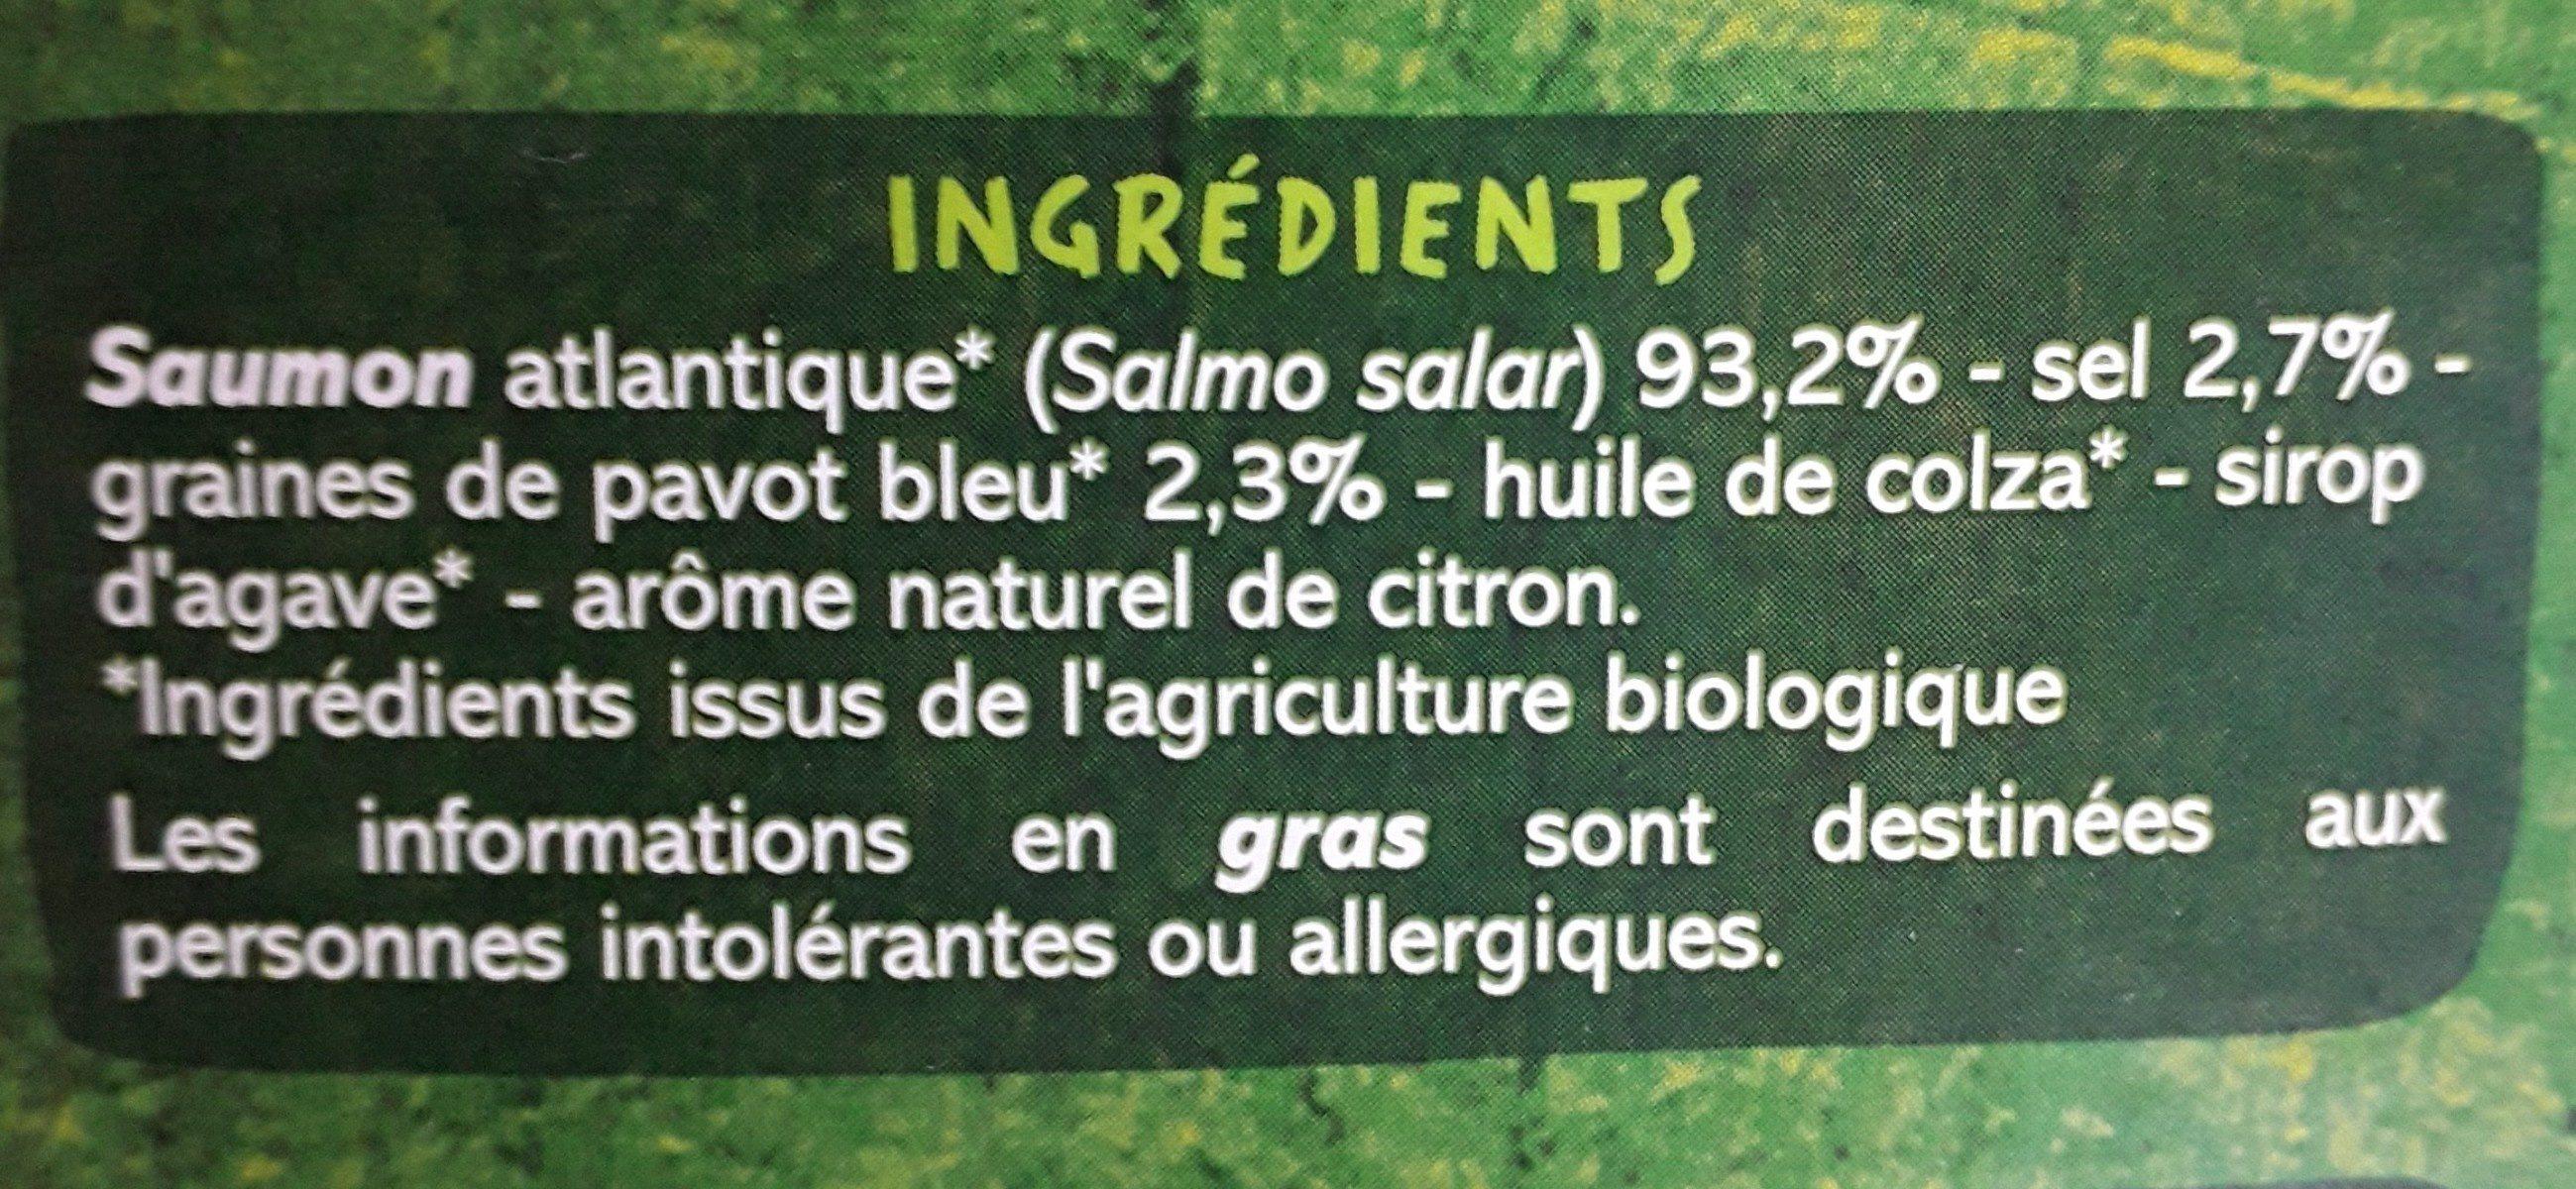 Emincés de saumon fumé BIO au pavot - Ingrediënten - fr